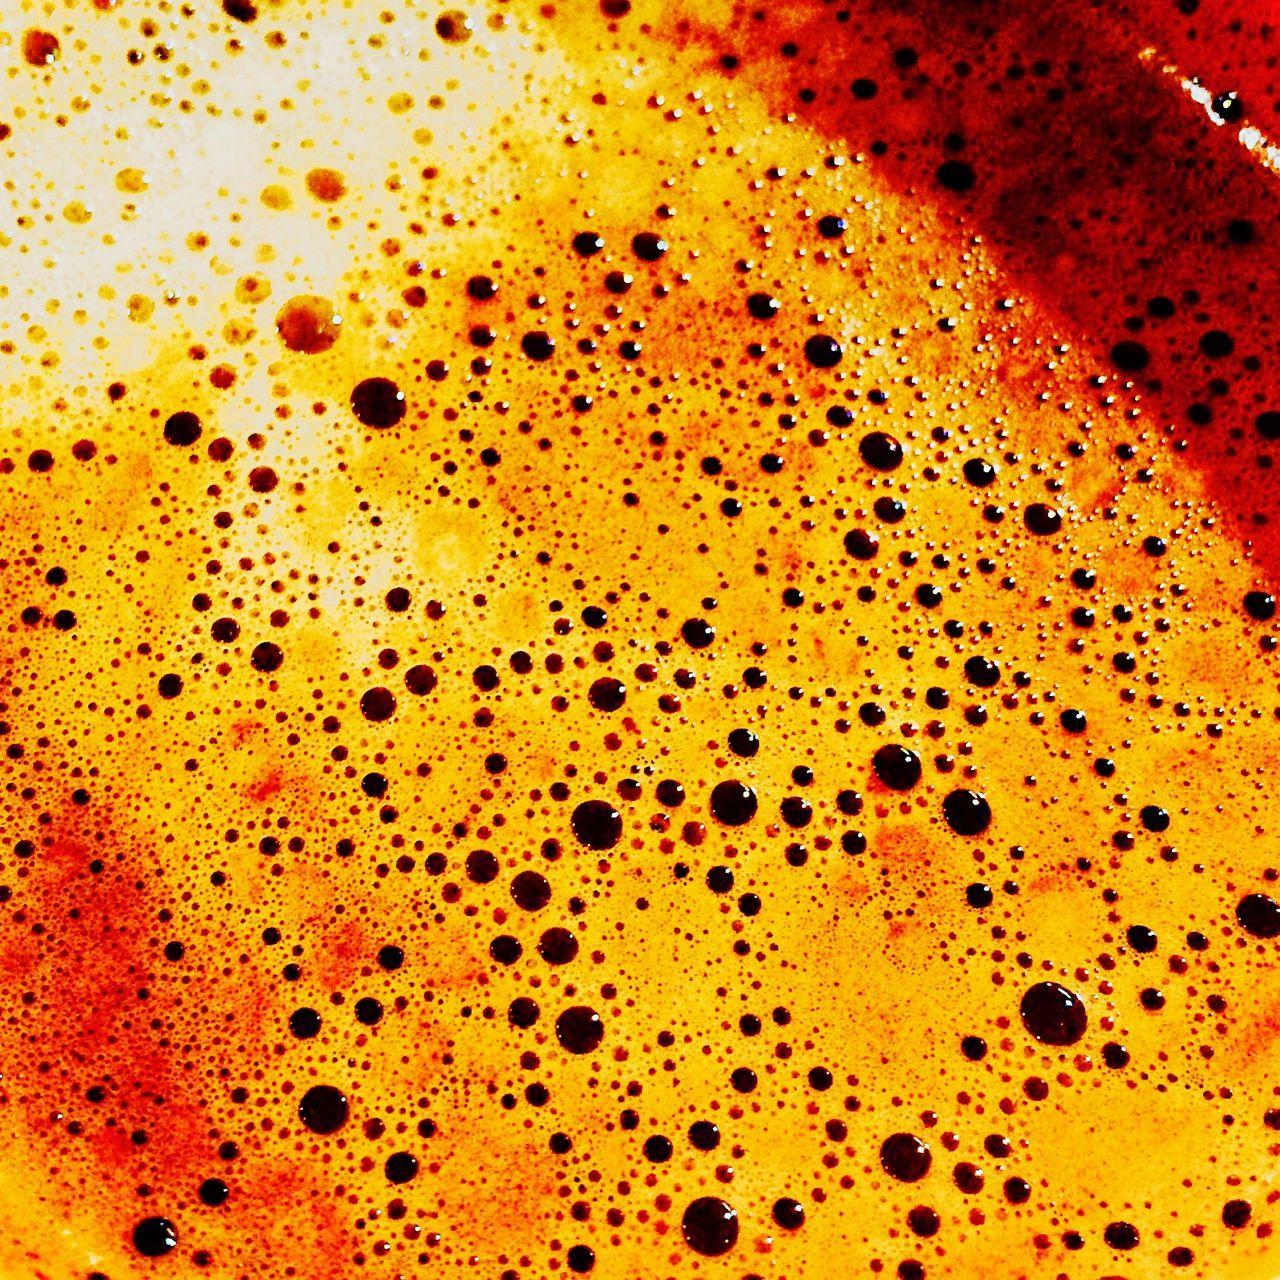 Hot Chocolate Coffee Bubbles Foam Cappuccino Drink Beverage Macro